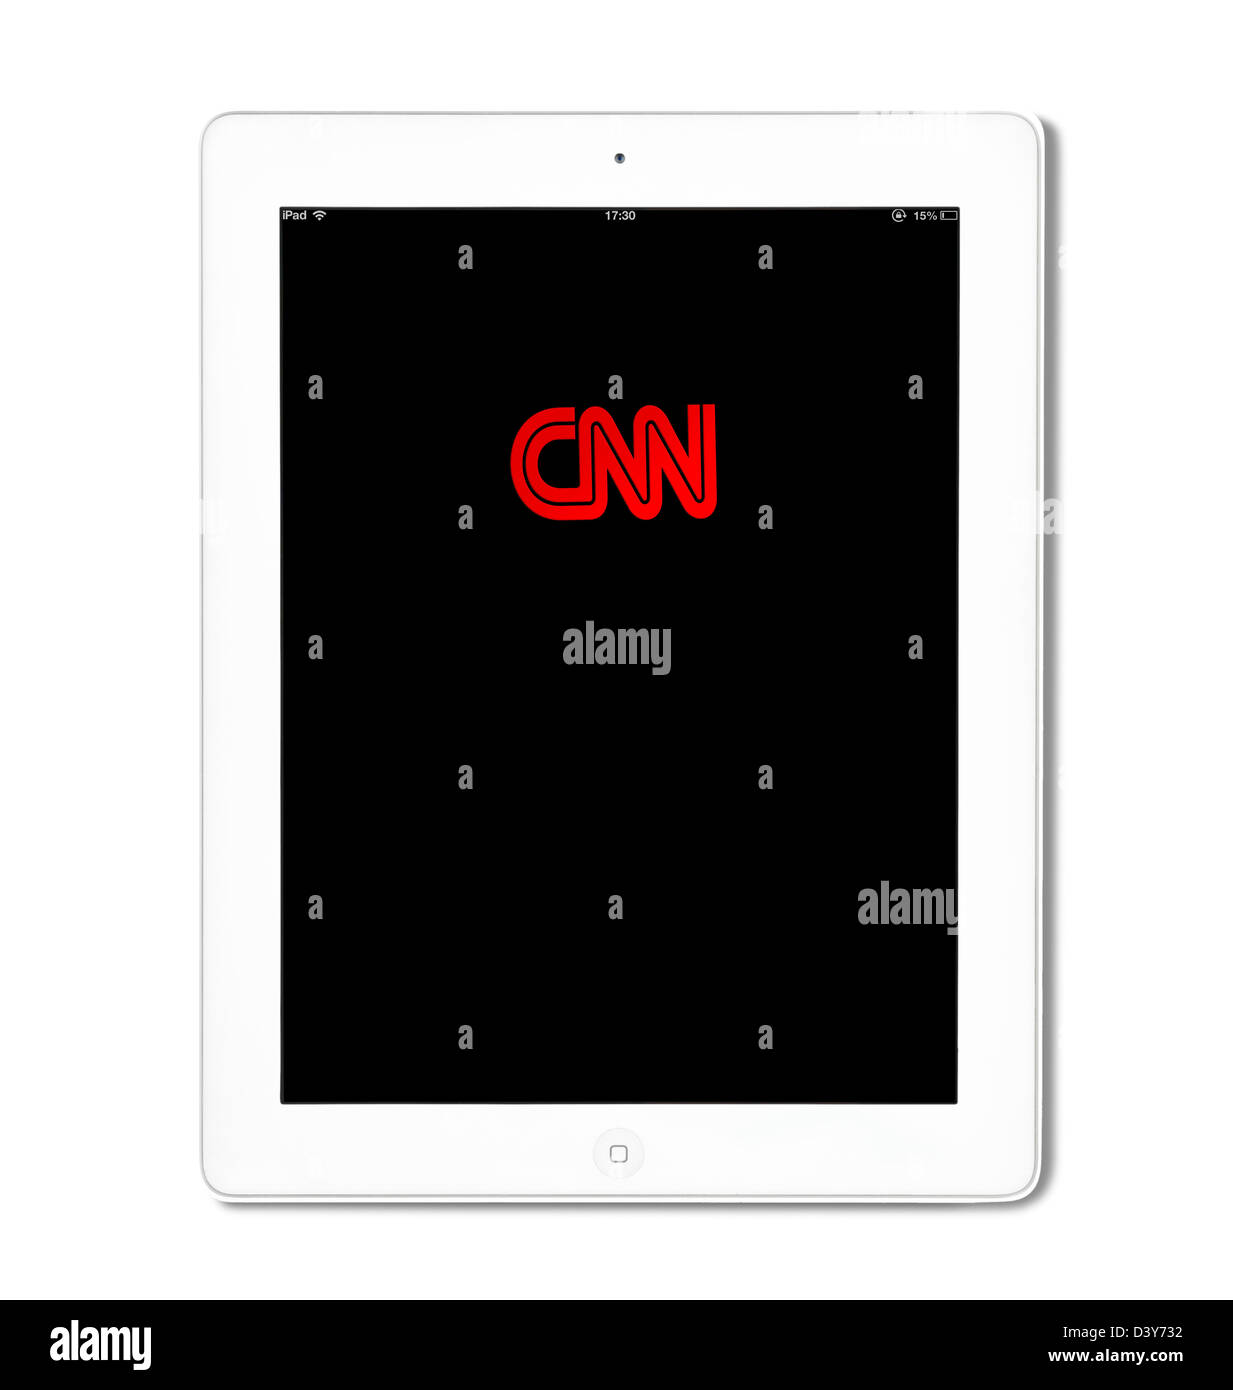 CNN iPad App sur un Apple iPad 4e génération Photo Stock